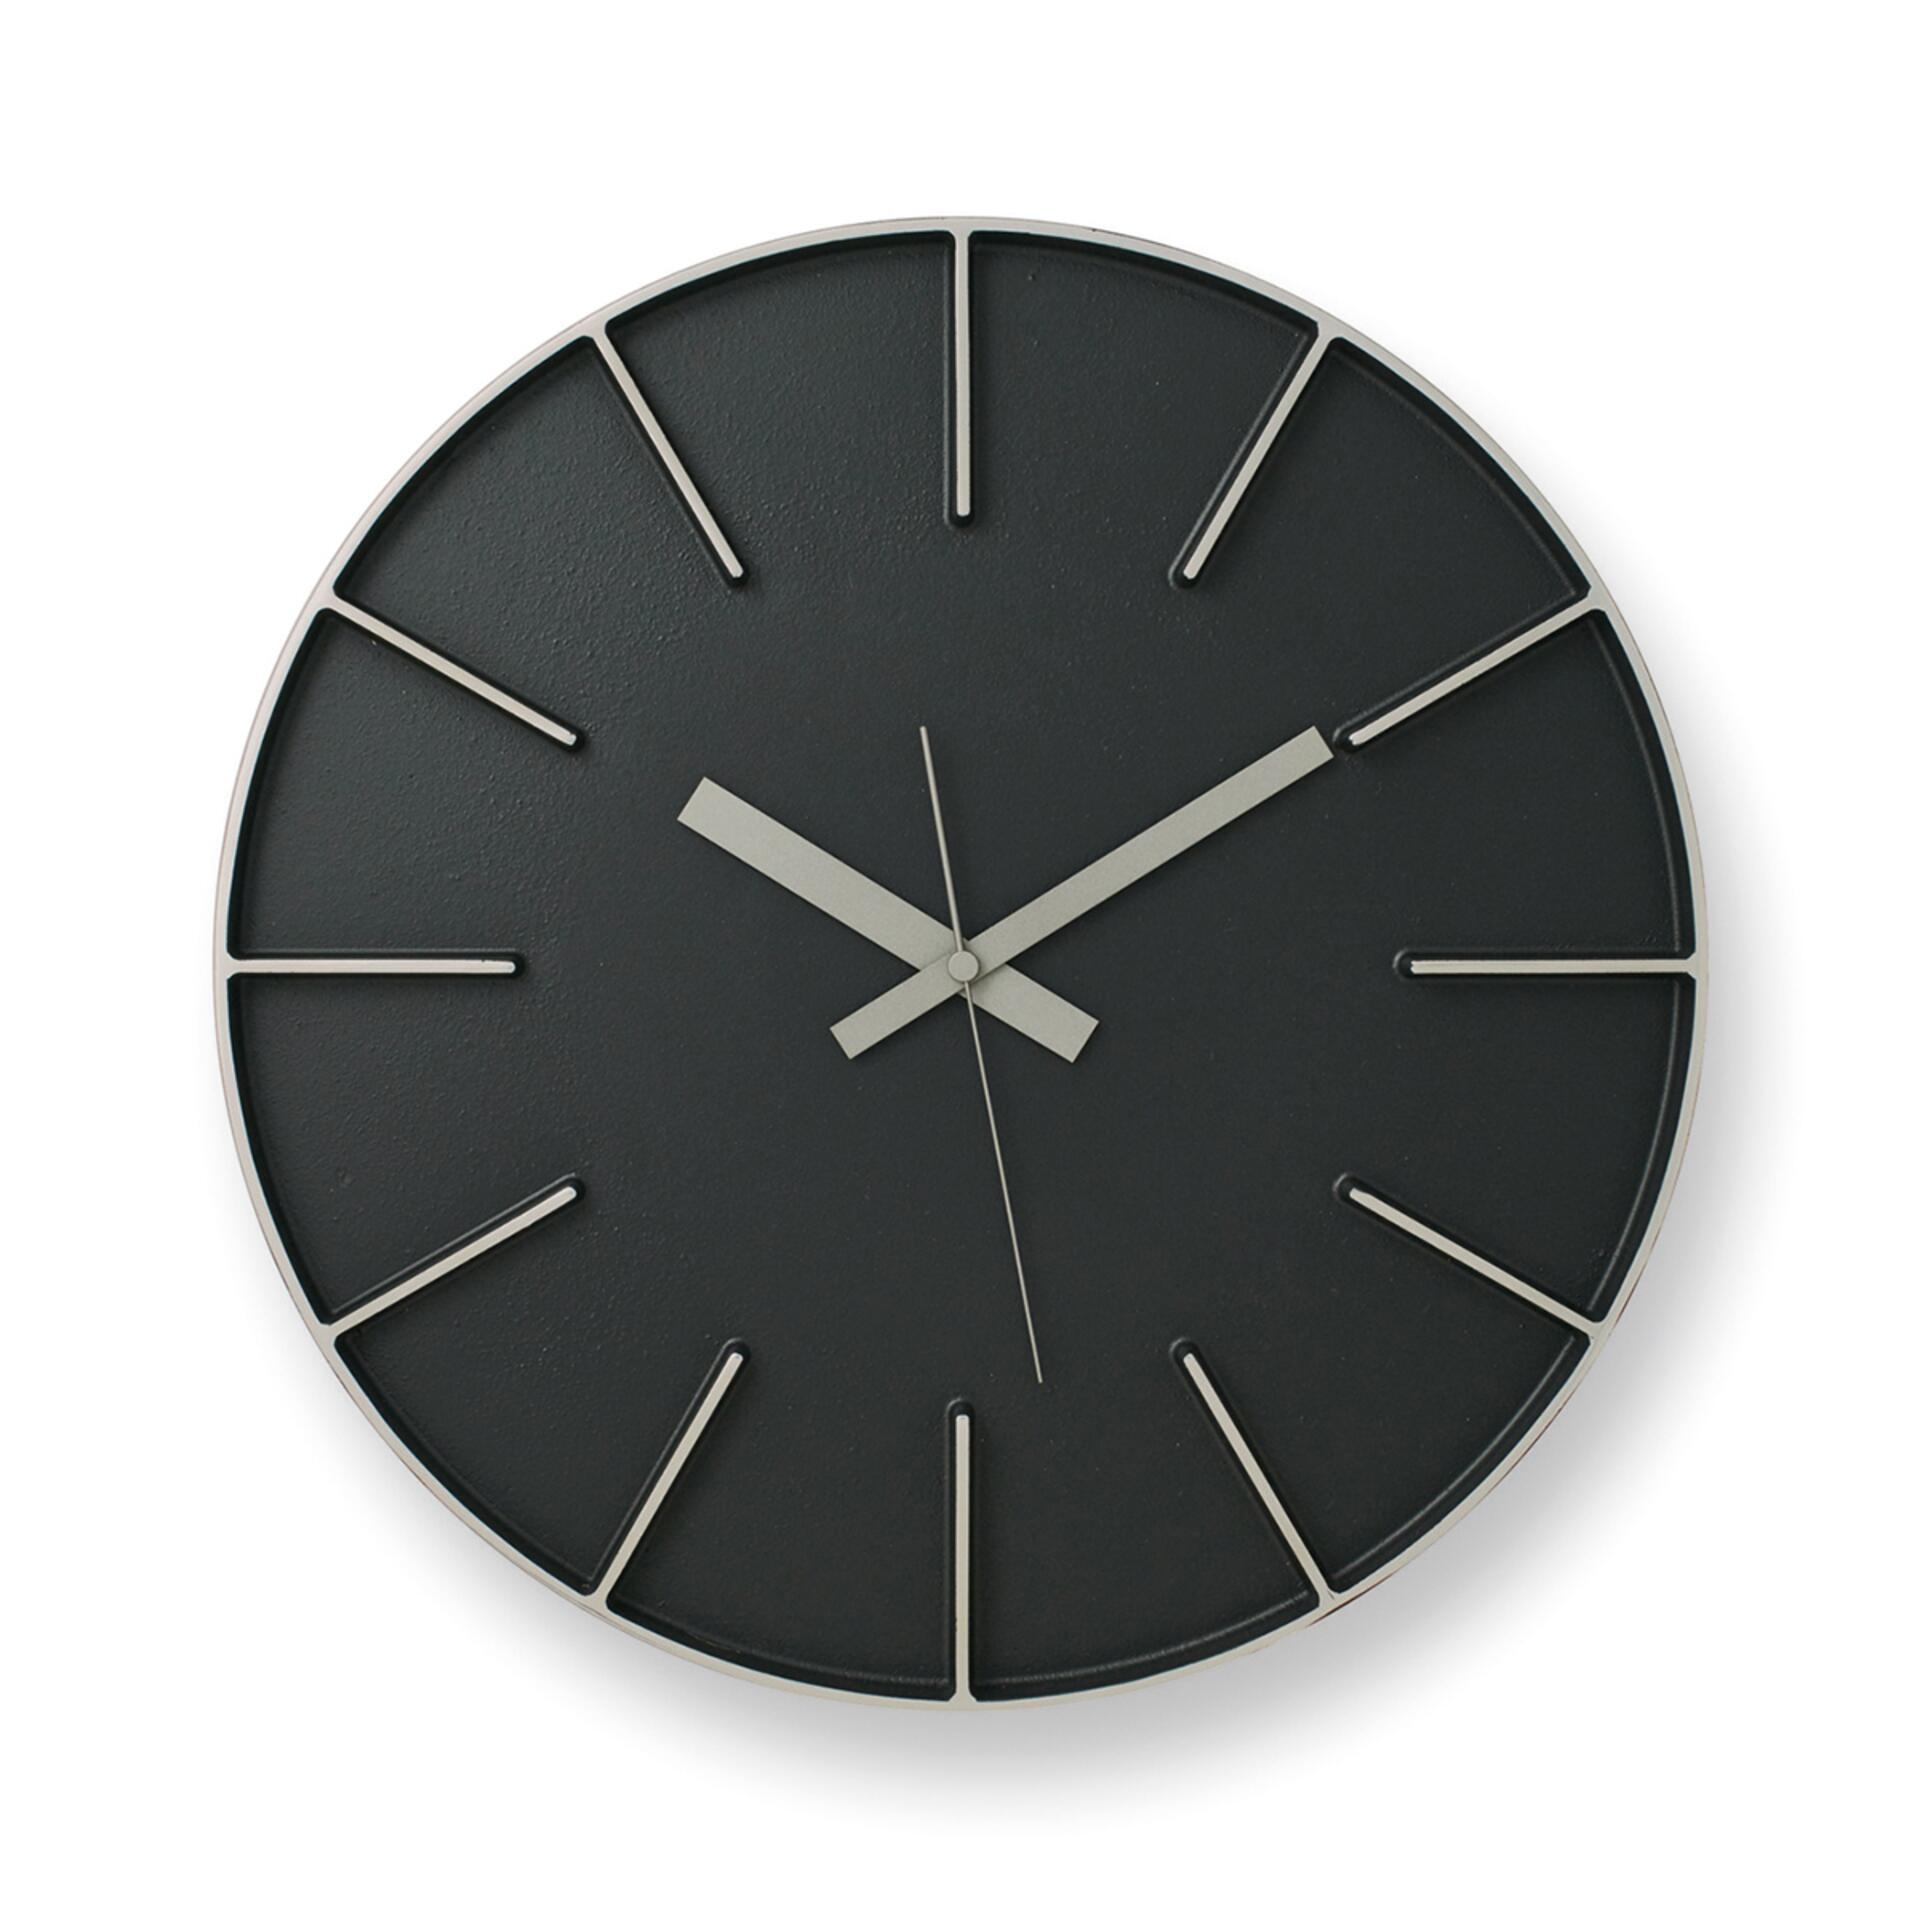 Lemnos Edge Clock Wanduhr Groß Schwarz